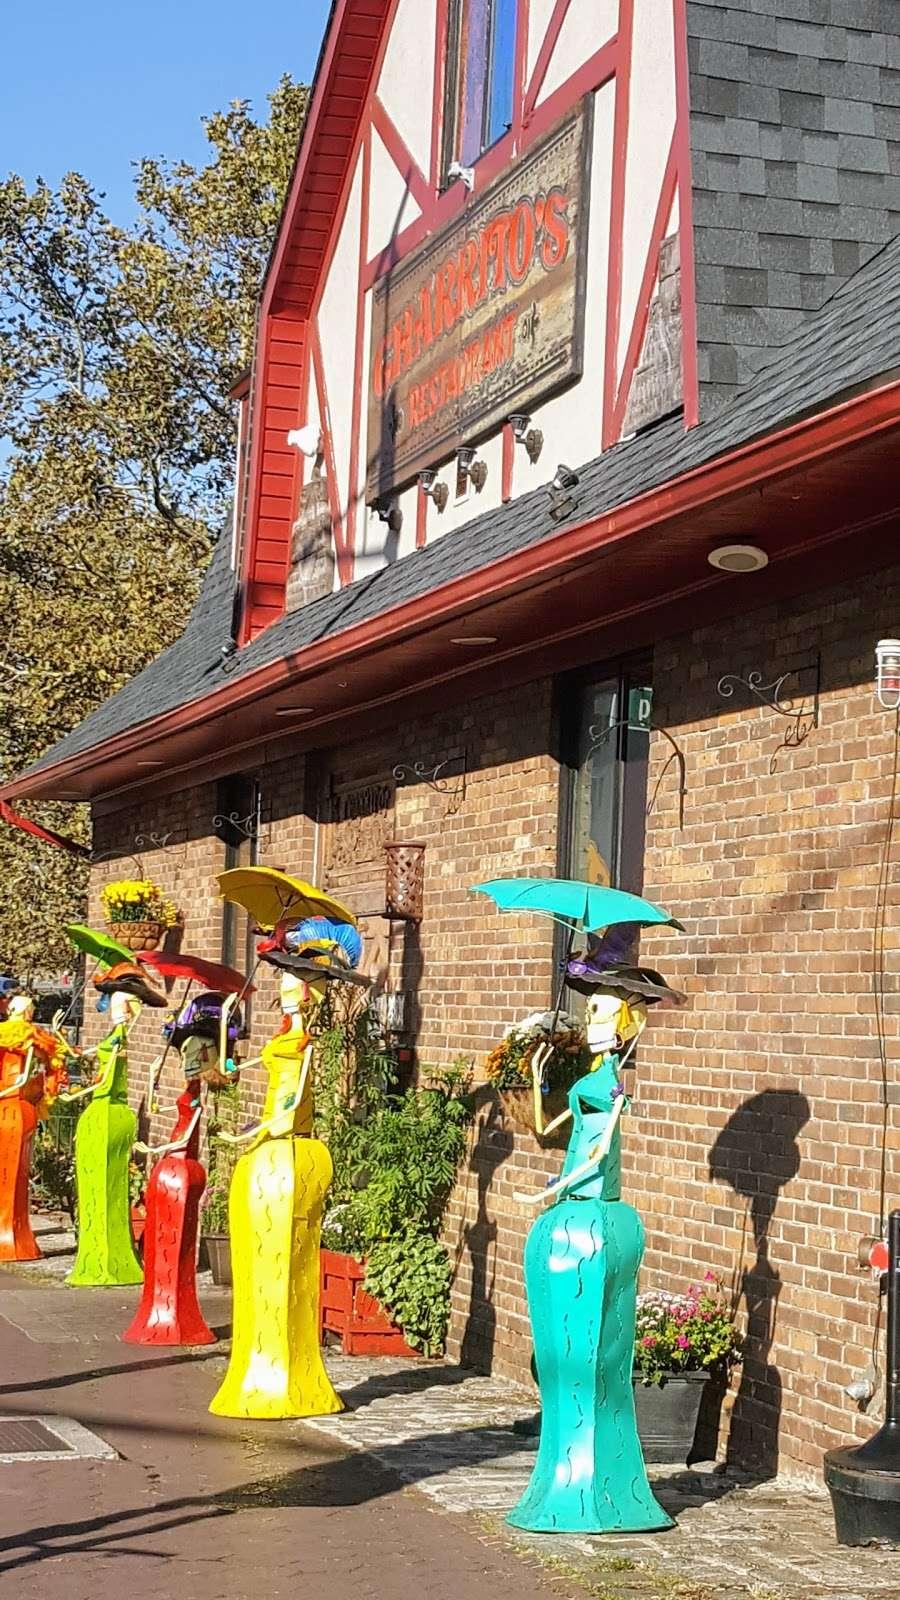 Charritos Weehawken - restaurant  | Photo 3 of 10 | Address: 974 John Fitzgerald Kennedy Blvd, Weehawken, NJ 07086, USA | Phone: (201) 330-1130